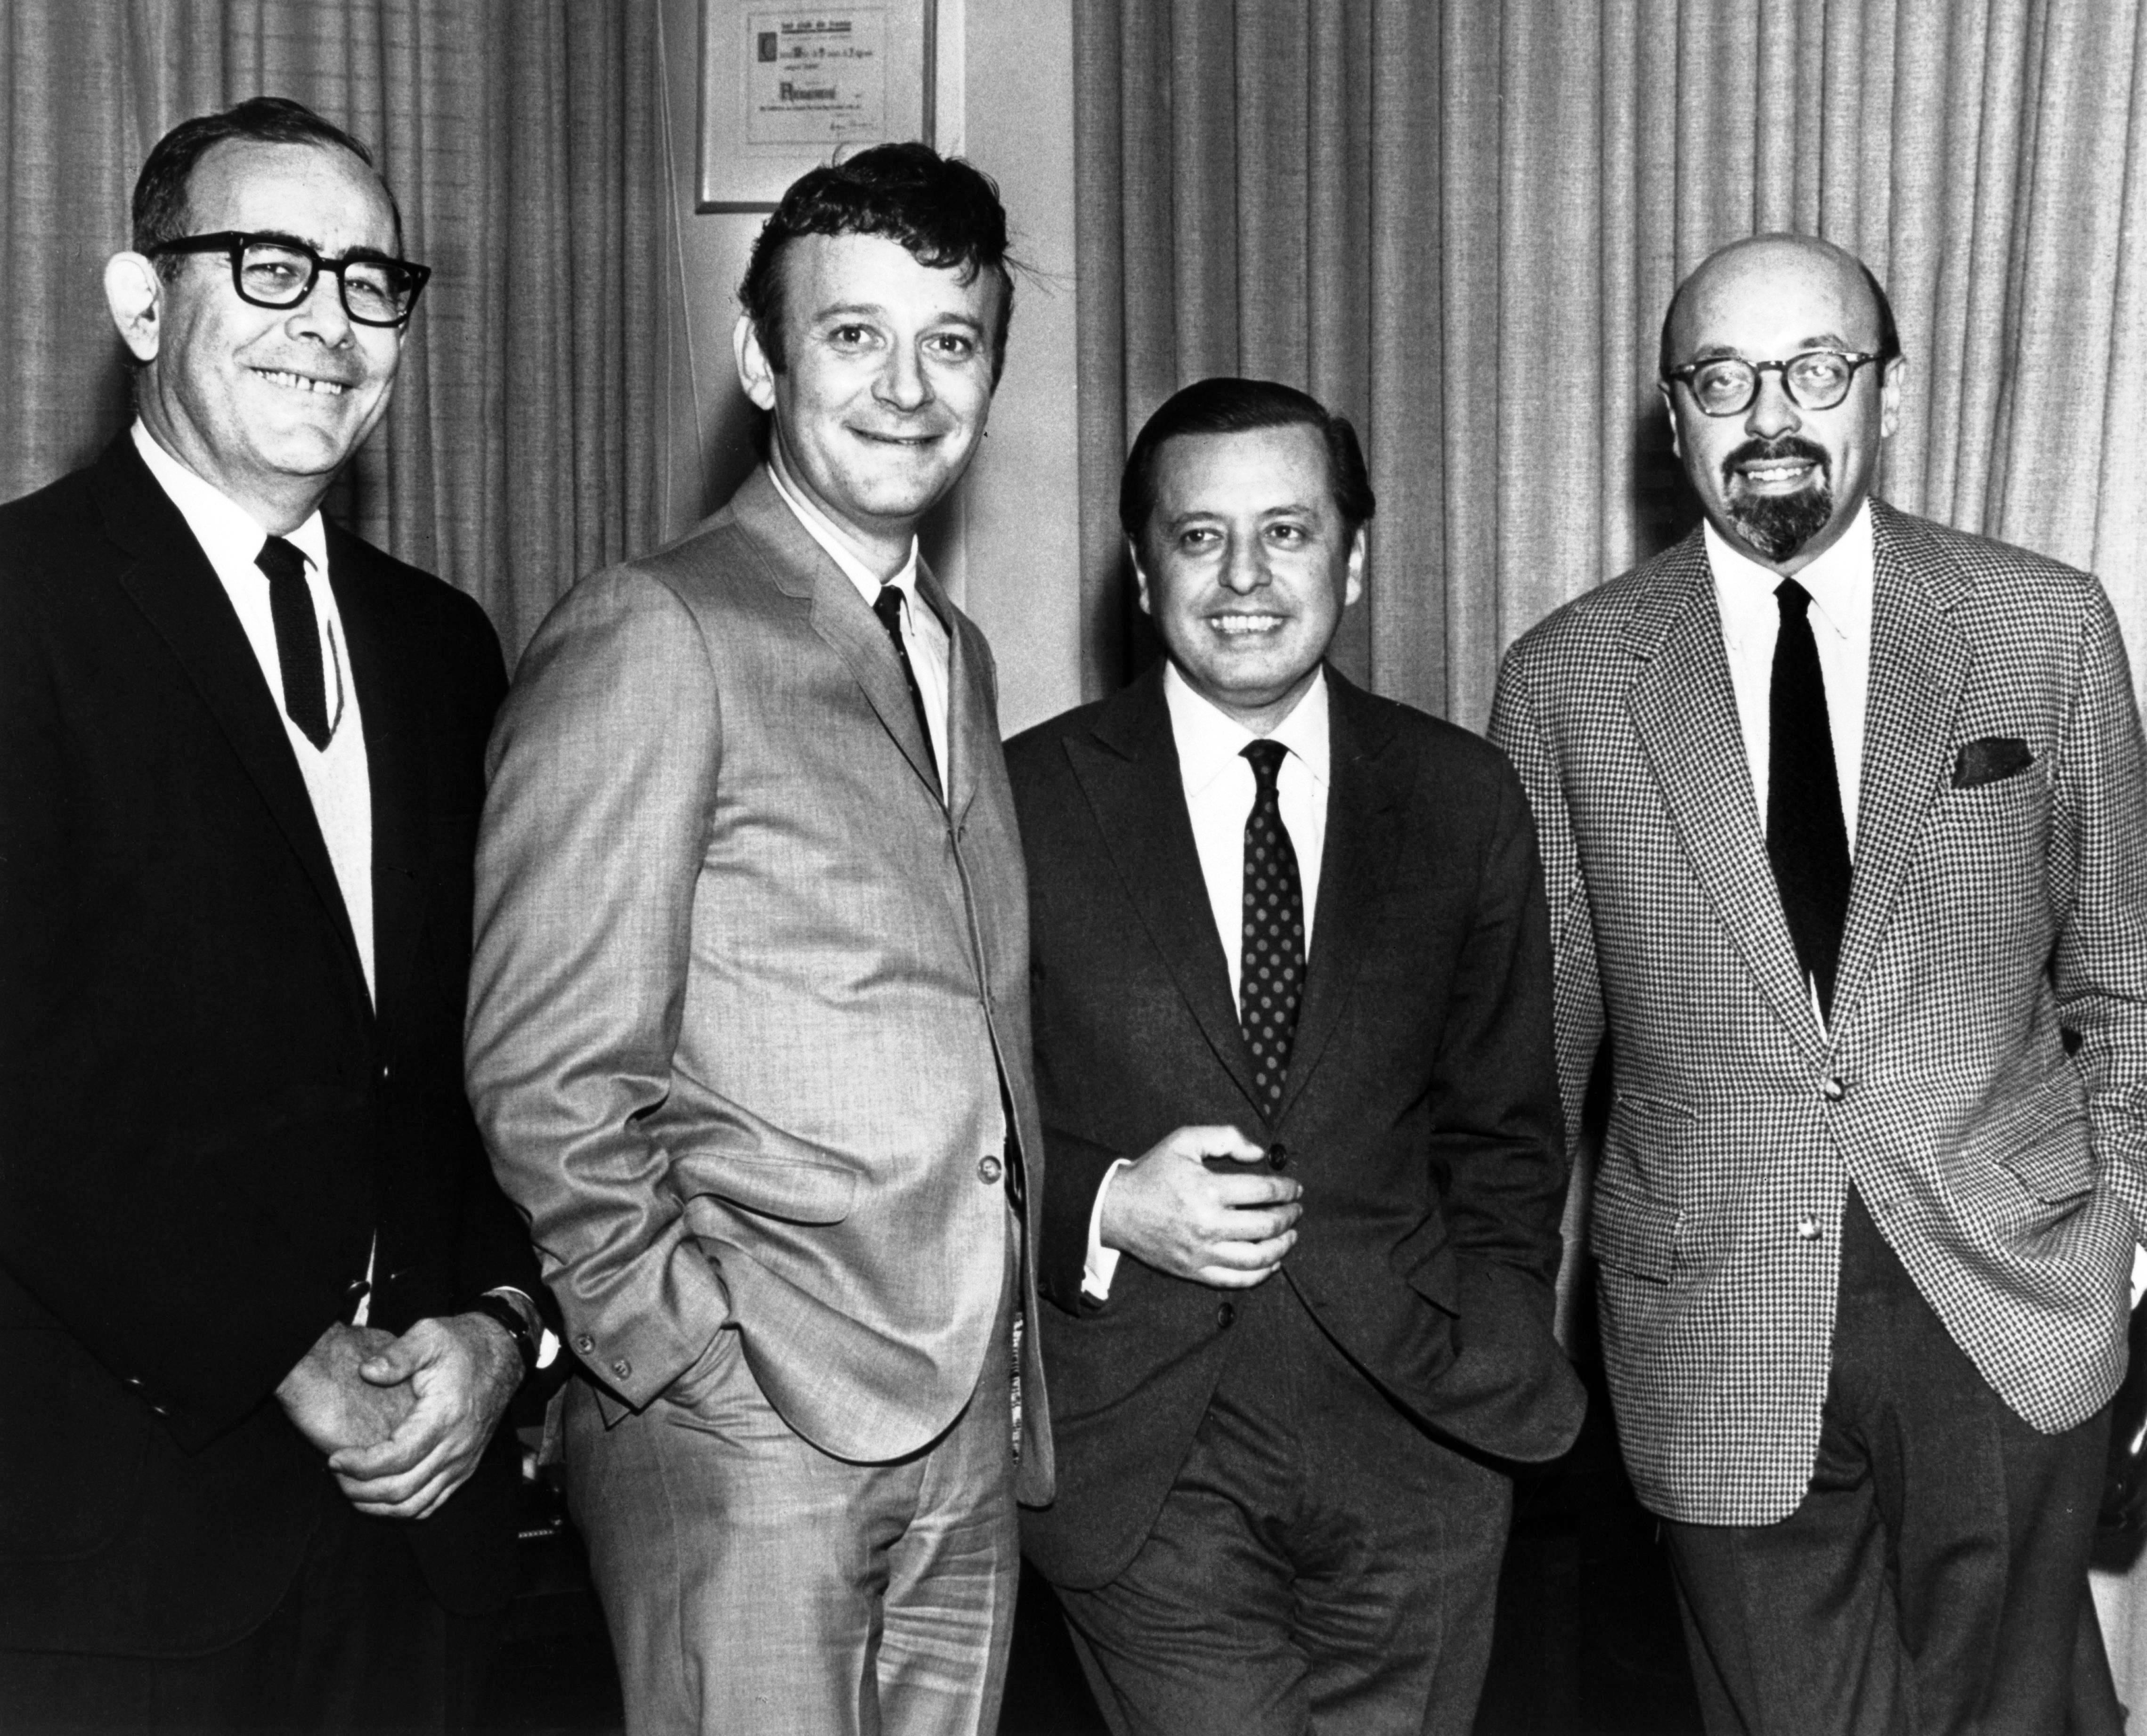 UNITED STATES - JANUARY 01: Photo of Bert BERNS and Ahmet ERTEGUN; L-R: ?, Bert Berns, ?, Ahmet Ertegun (founder of Atlantic Records) posed, (Photo by Charlie Gillett Collection/Redferns)